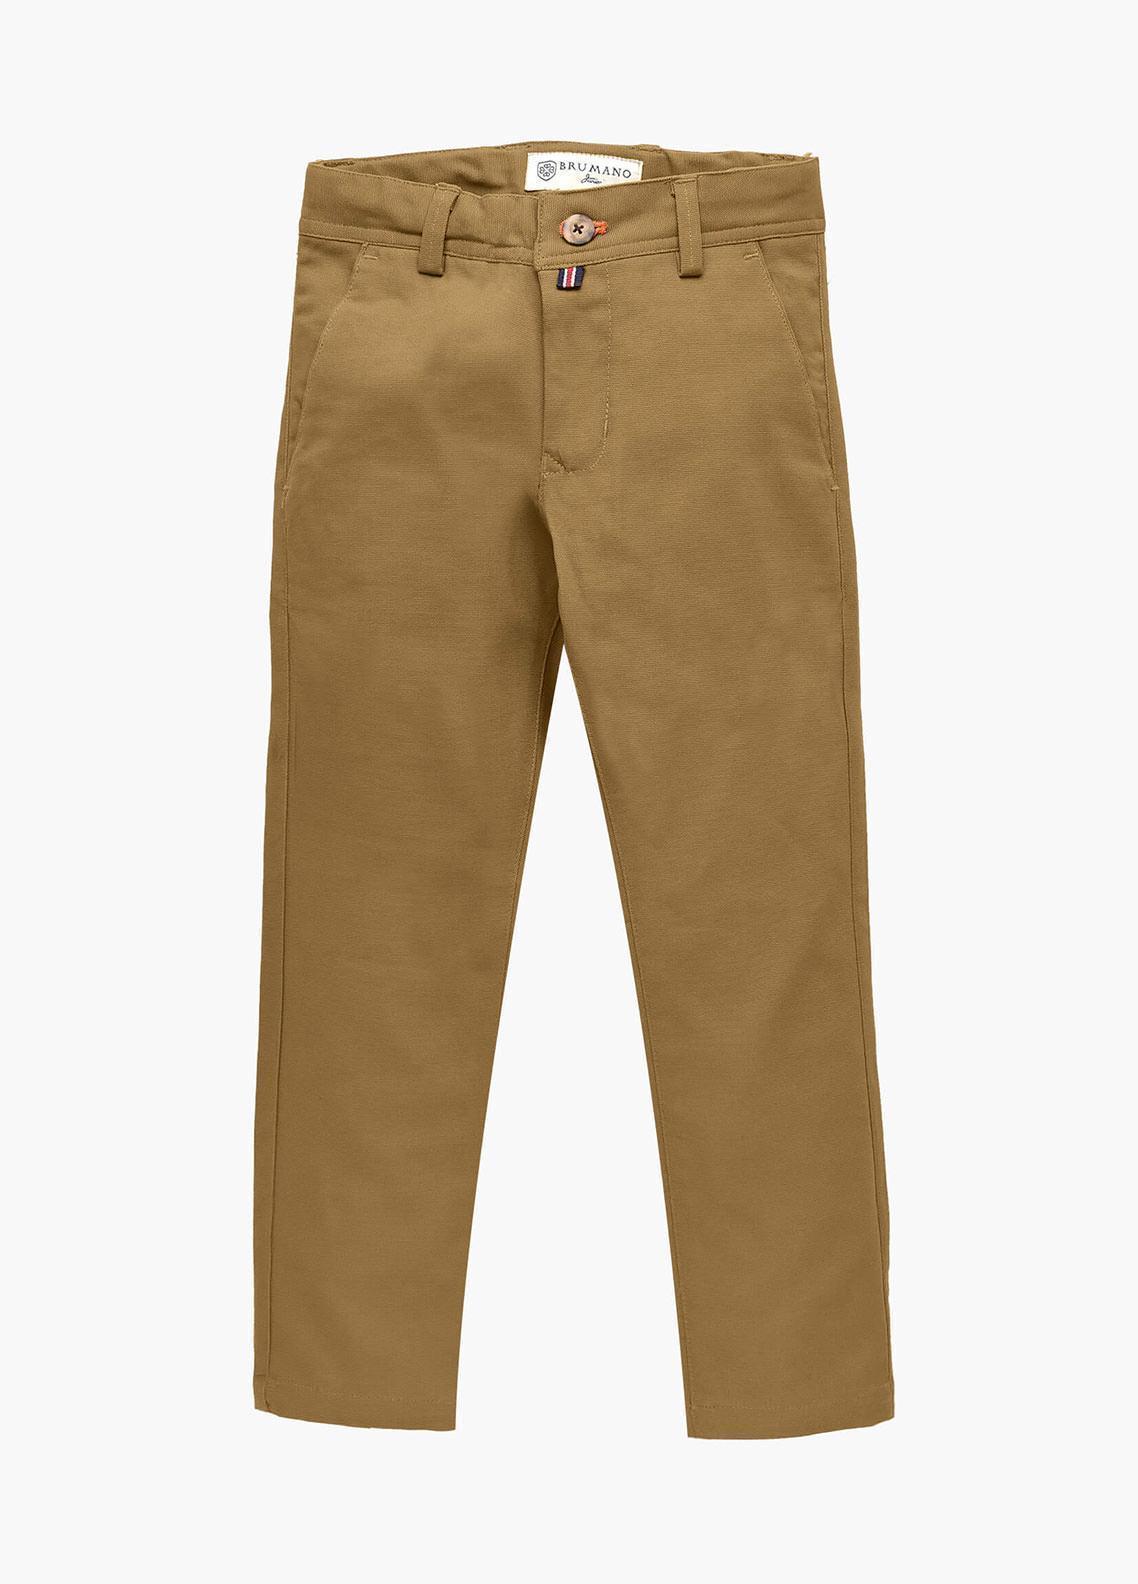 Brumano Cotton Casual Trousers for Boys - Blue BM20JP Khaki Casual Trouser-Junior